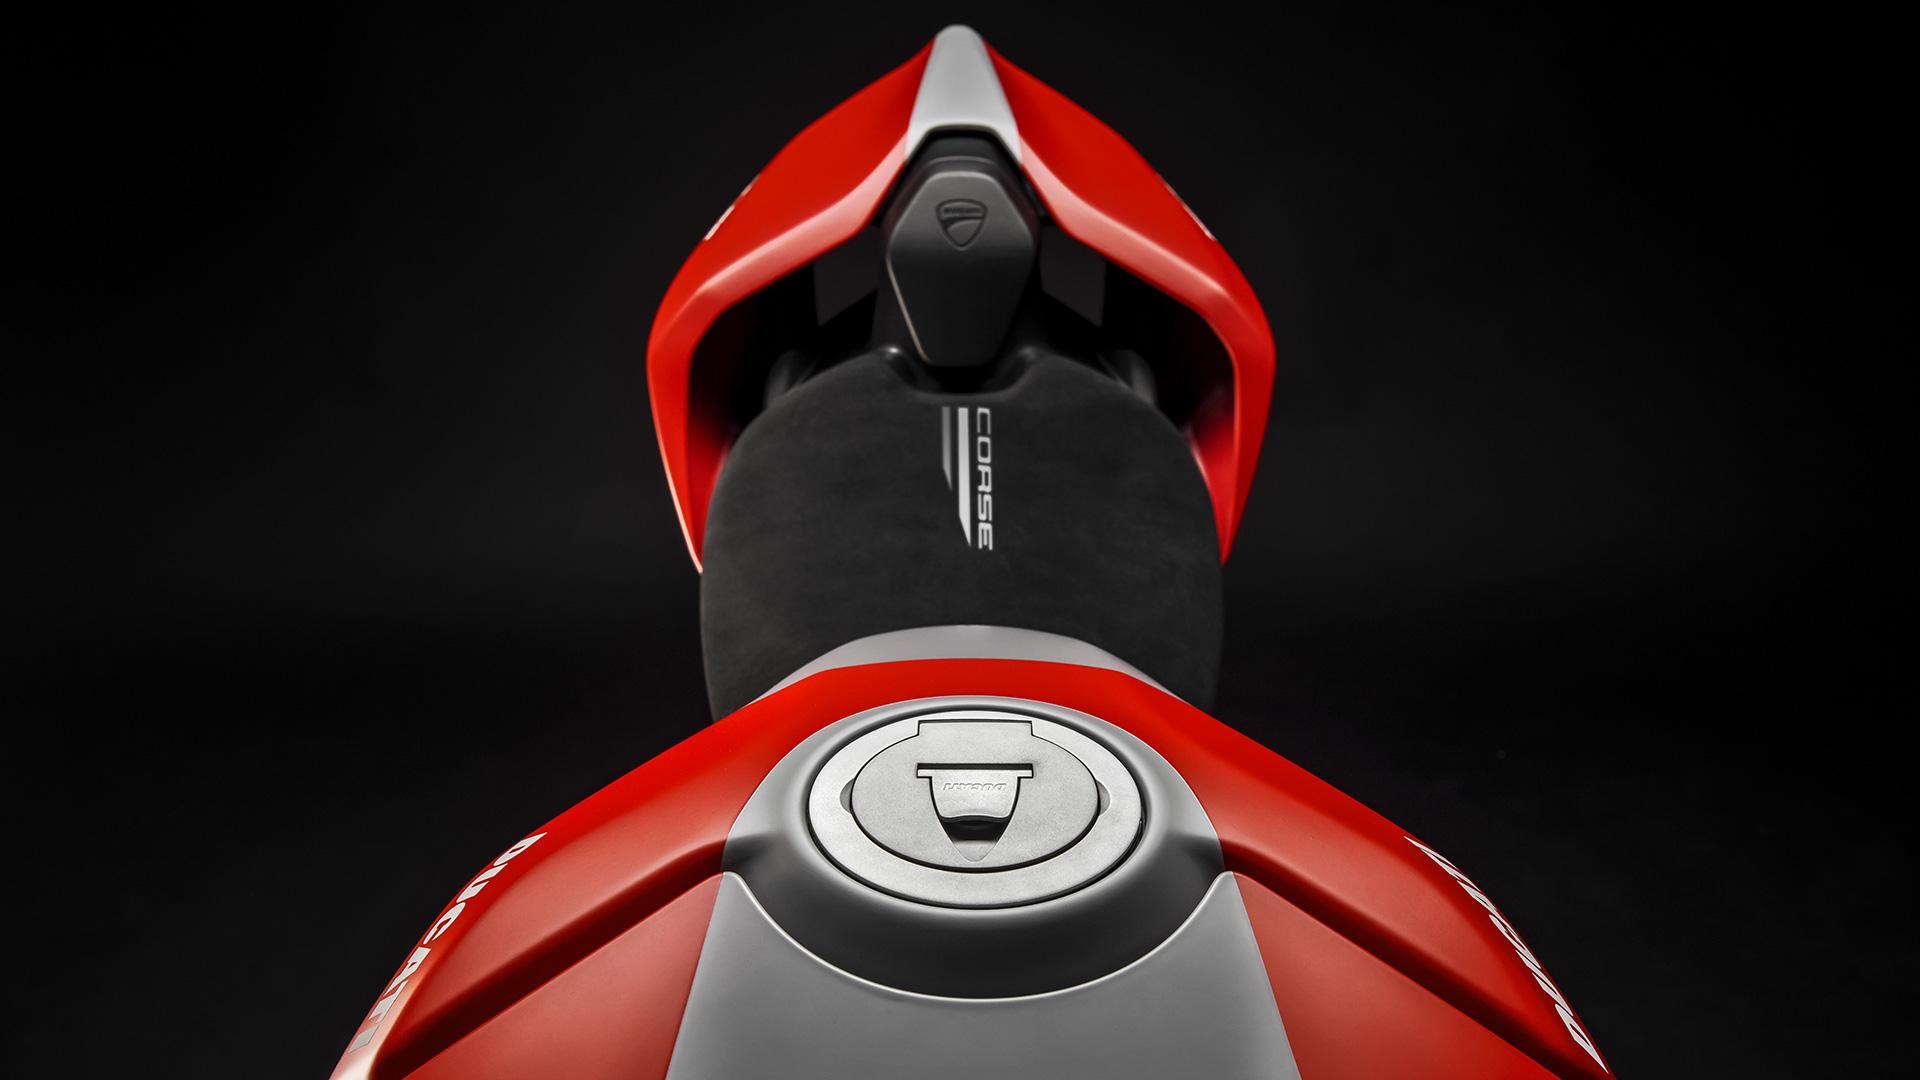 Ducati Panigale V4: A New Opera